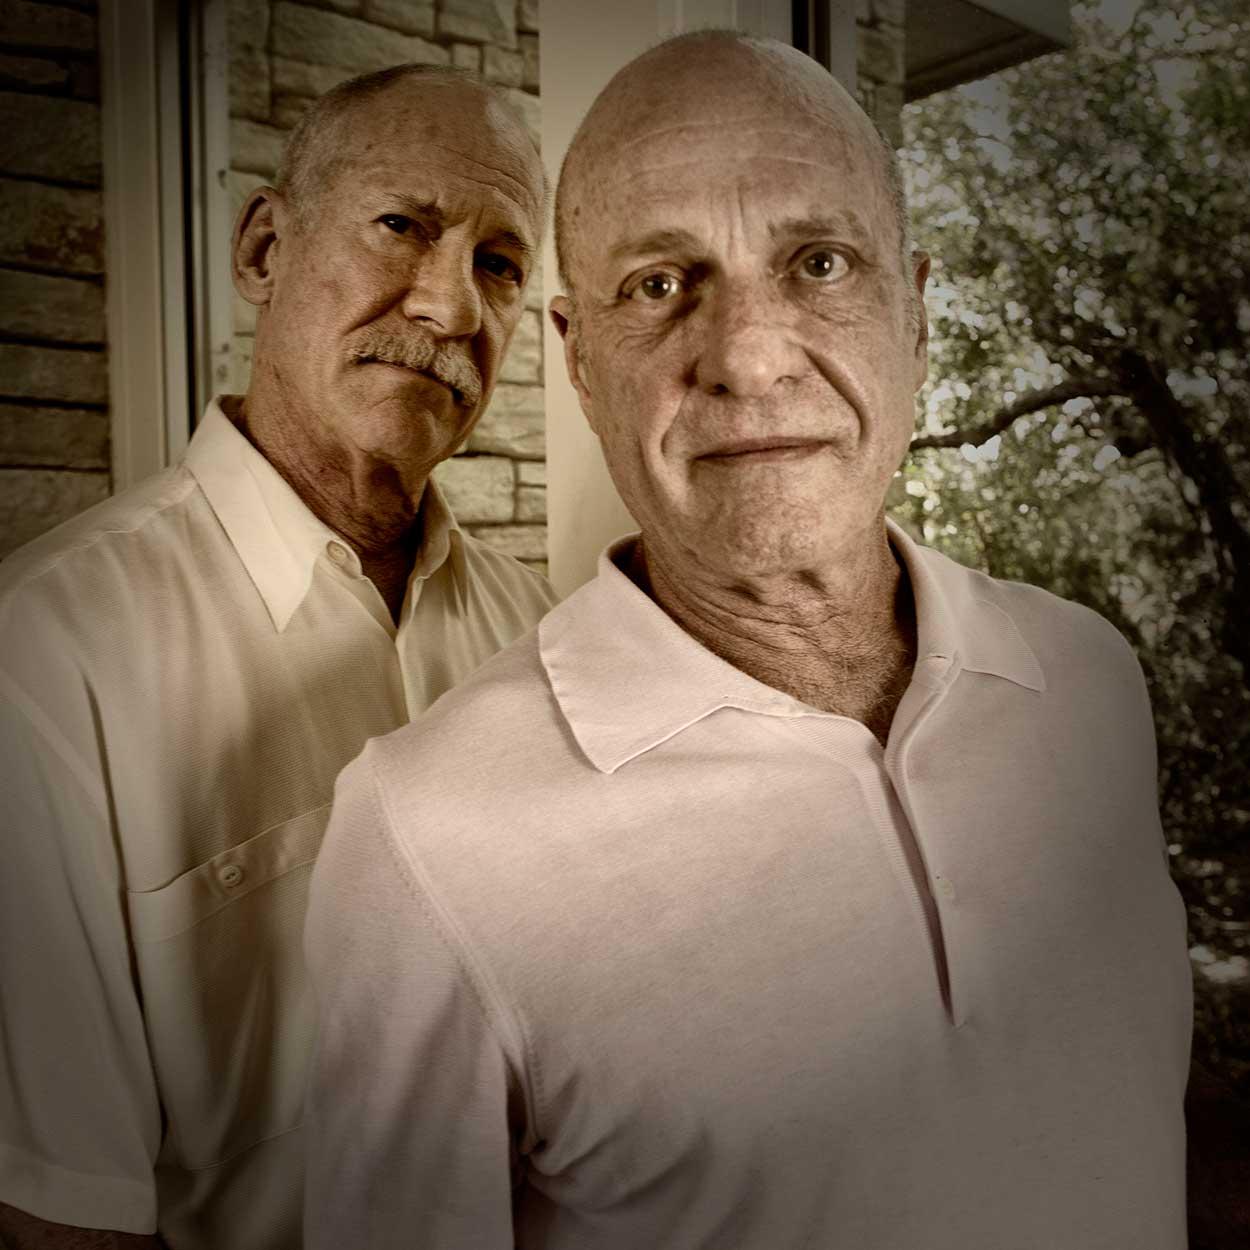 Long Term AIDs Survivor Gary Cooper and His Partner Richard